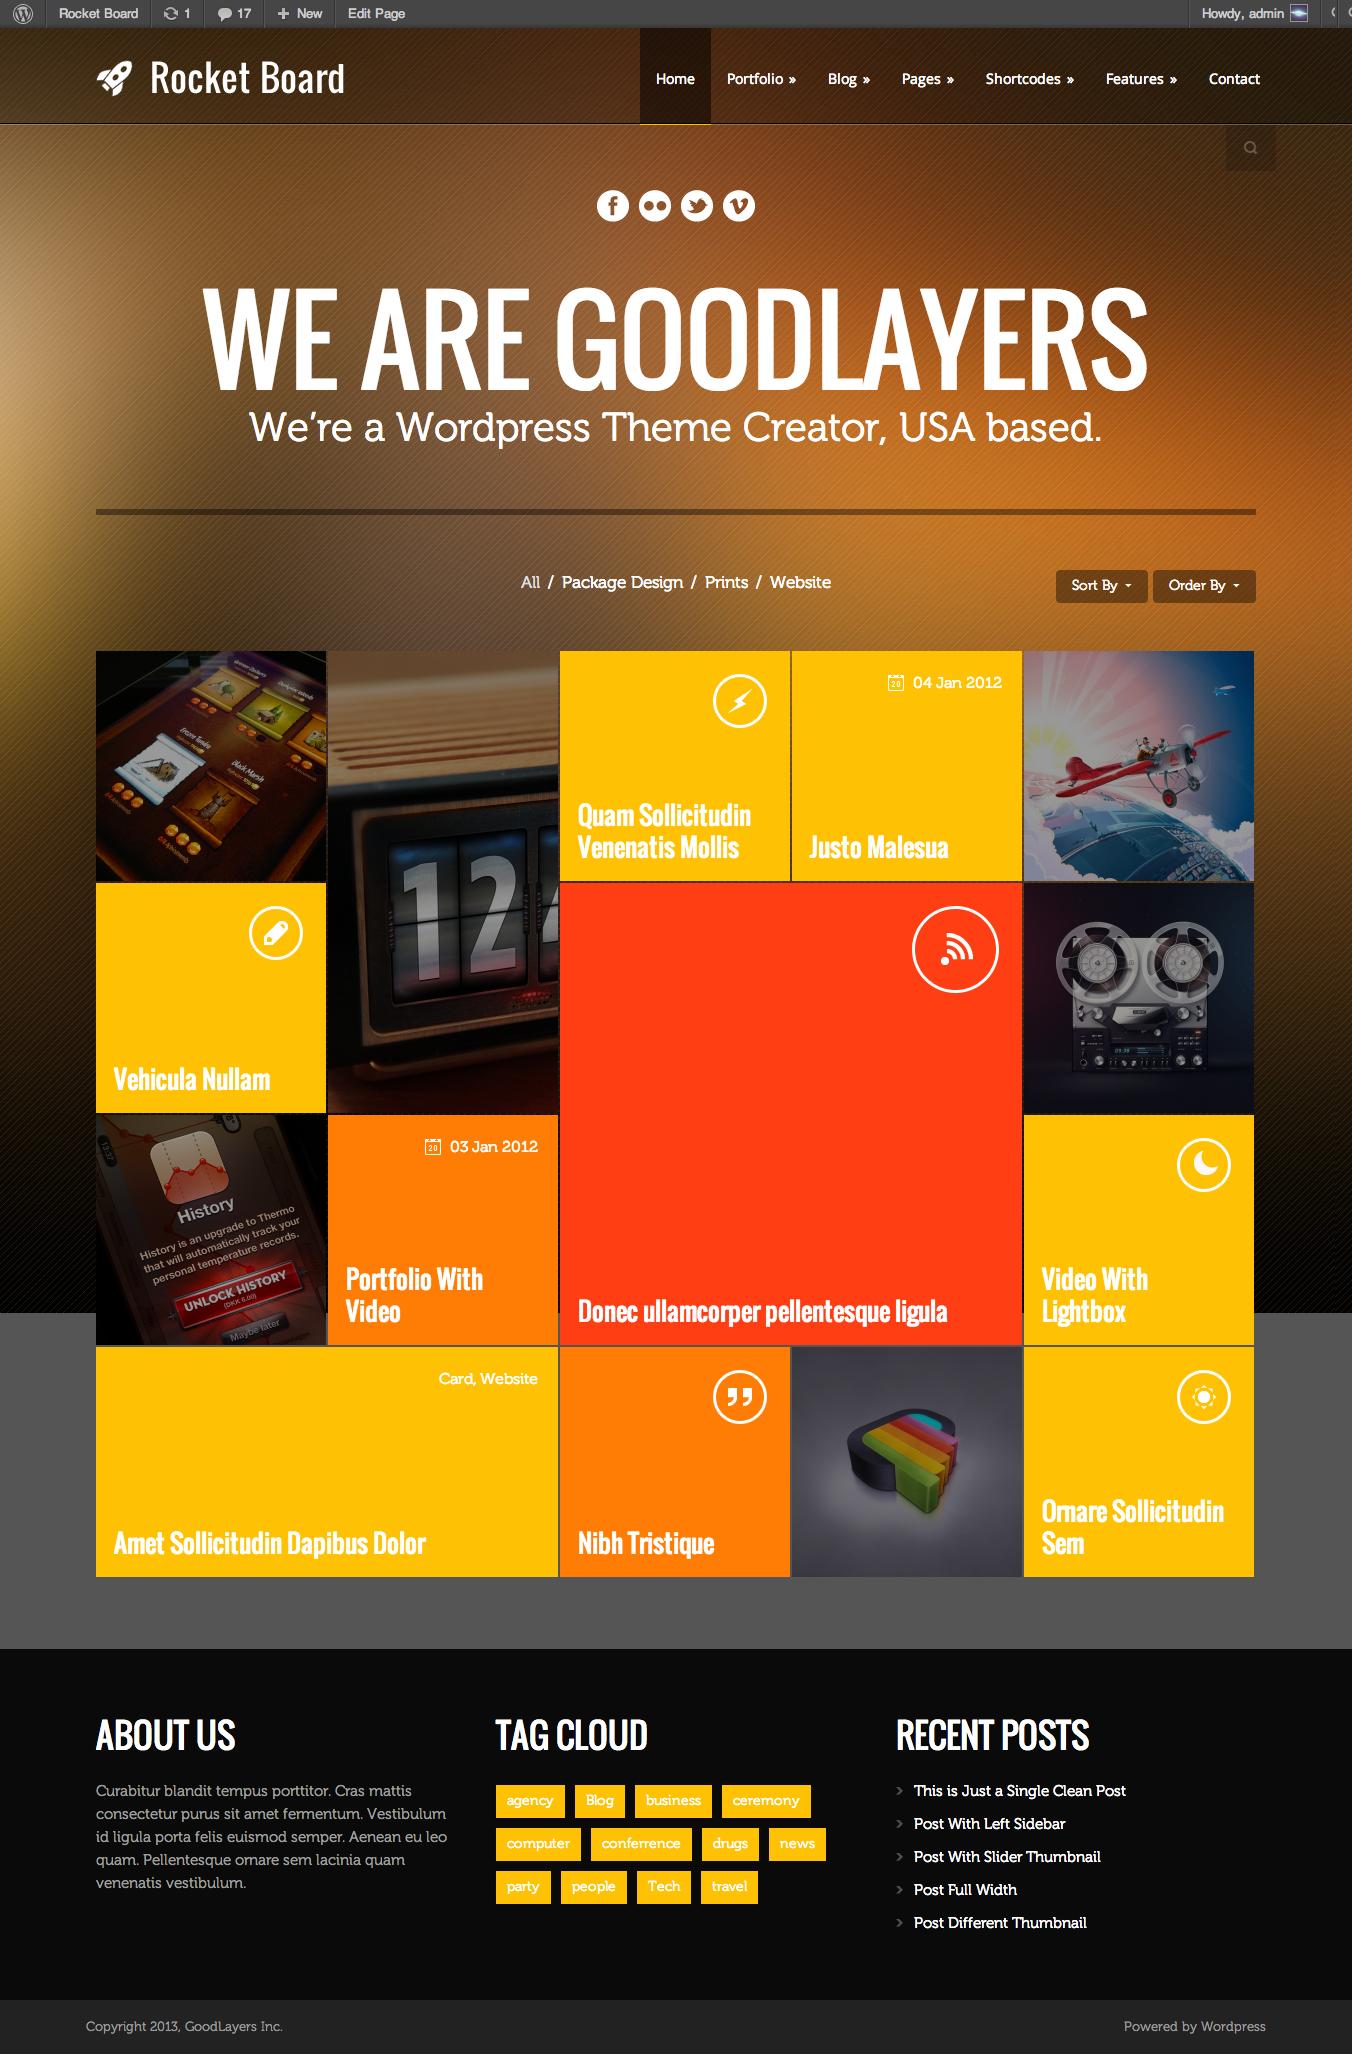 Rocket Board - Metro Wordpress Theme by GoodLayers   ThemeForest